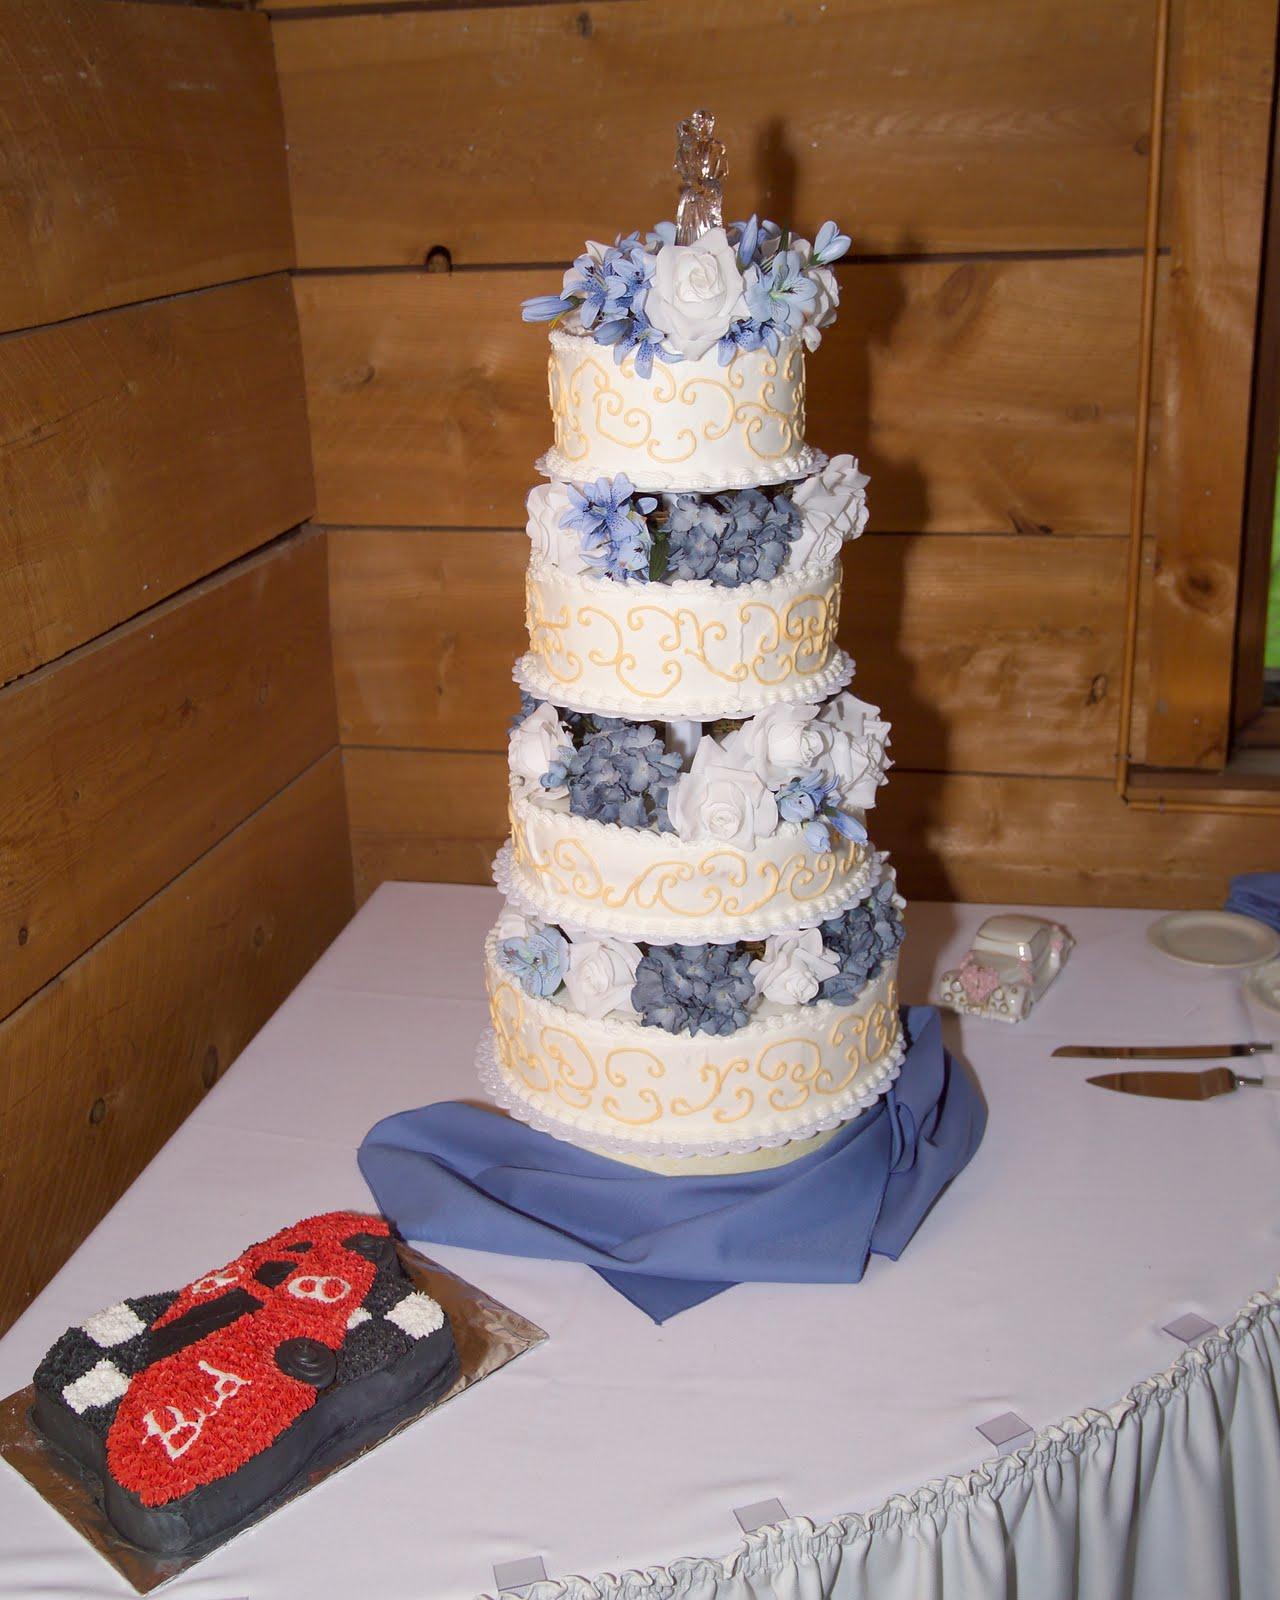 Katies Creative Cakes